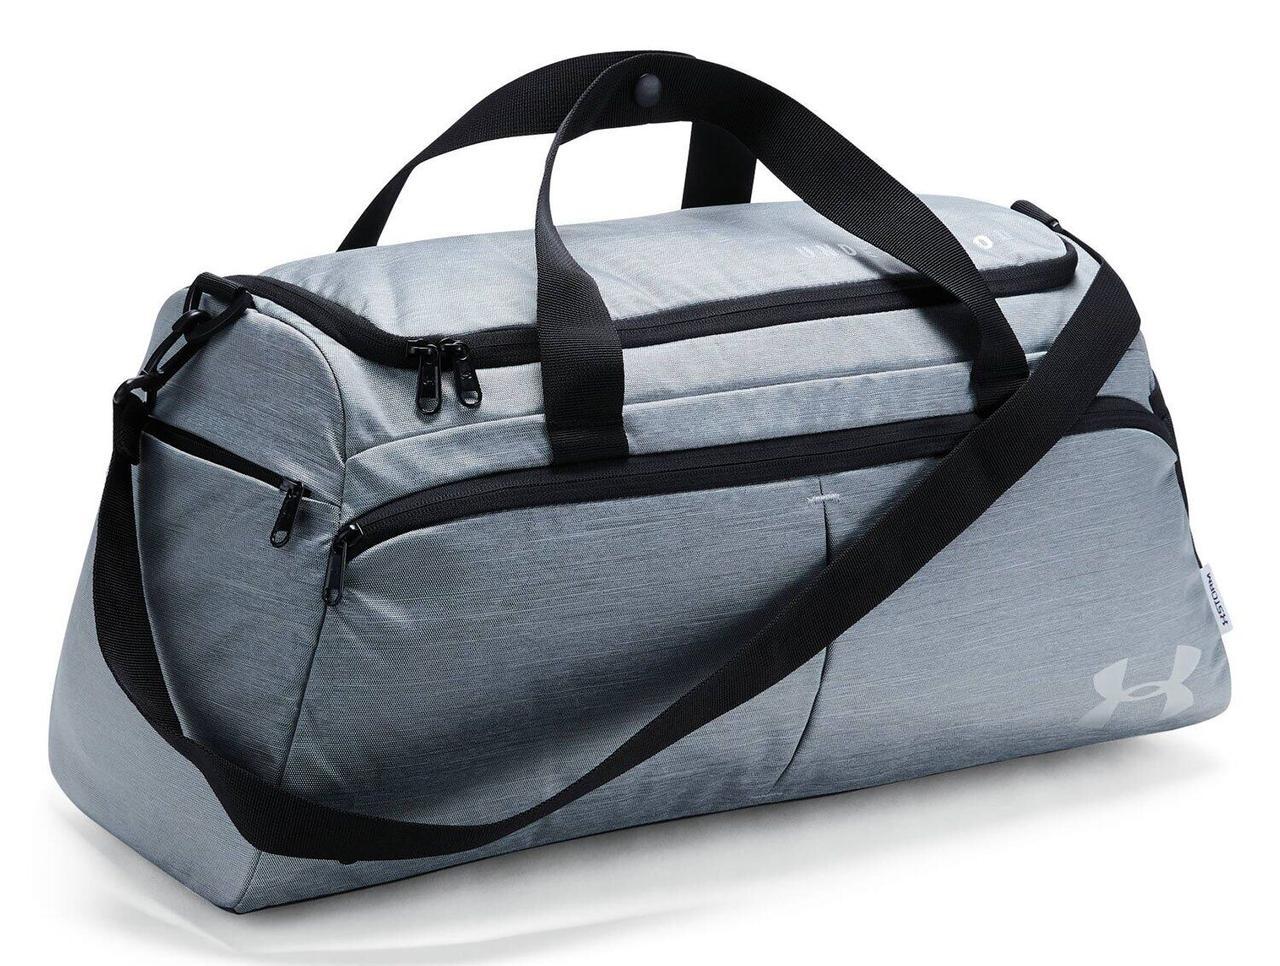 Спортивная сумка Under Armour W's Undeniable Duffle-S, серая (1306405-001)